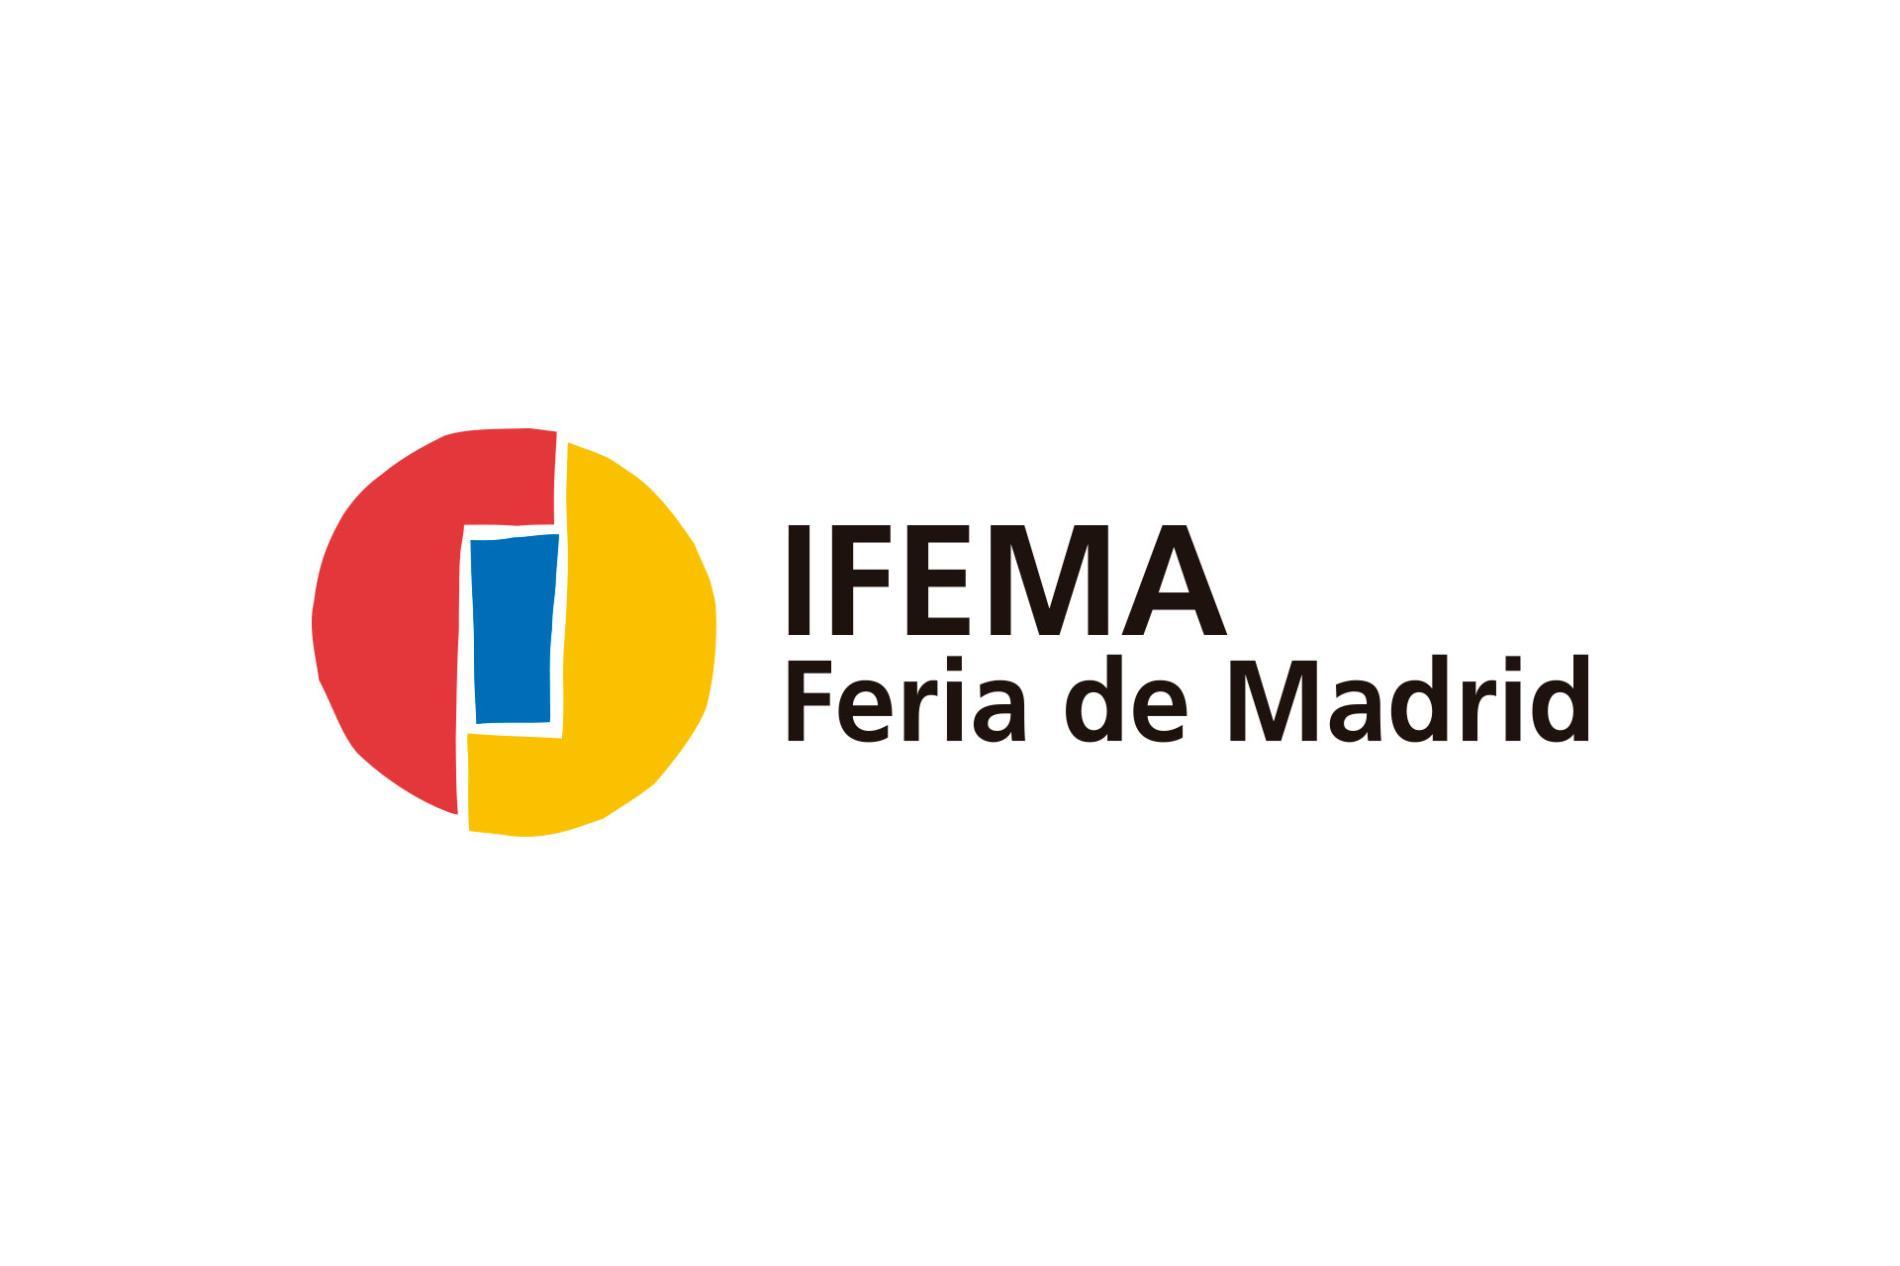 IFEMA logo